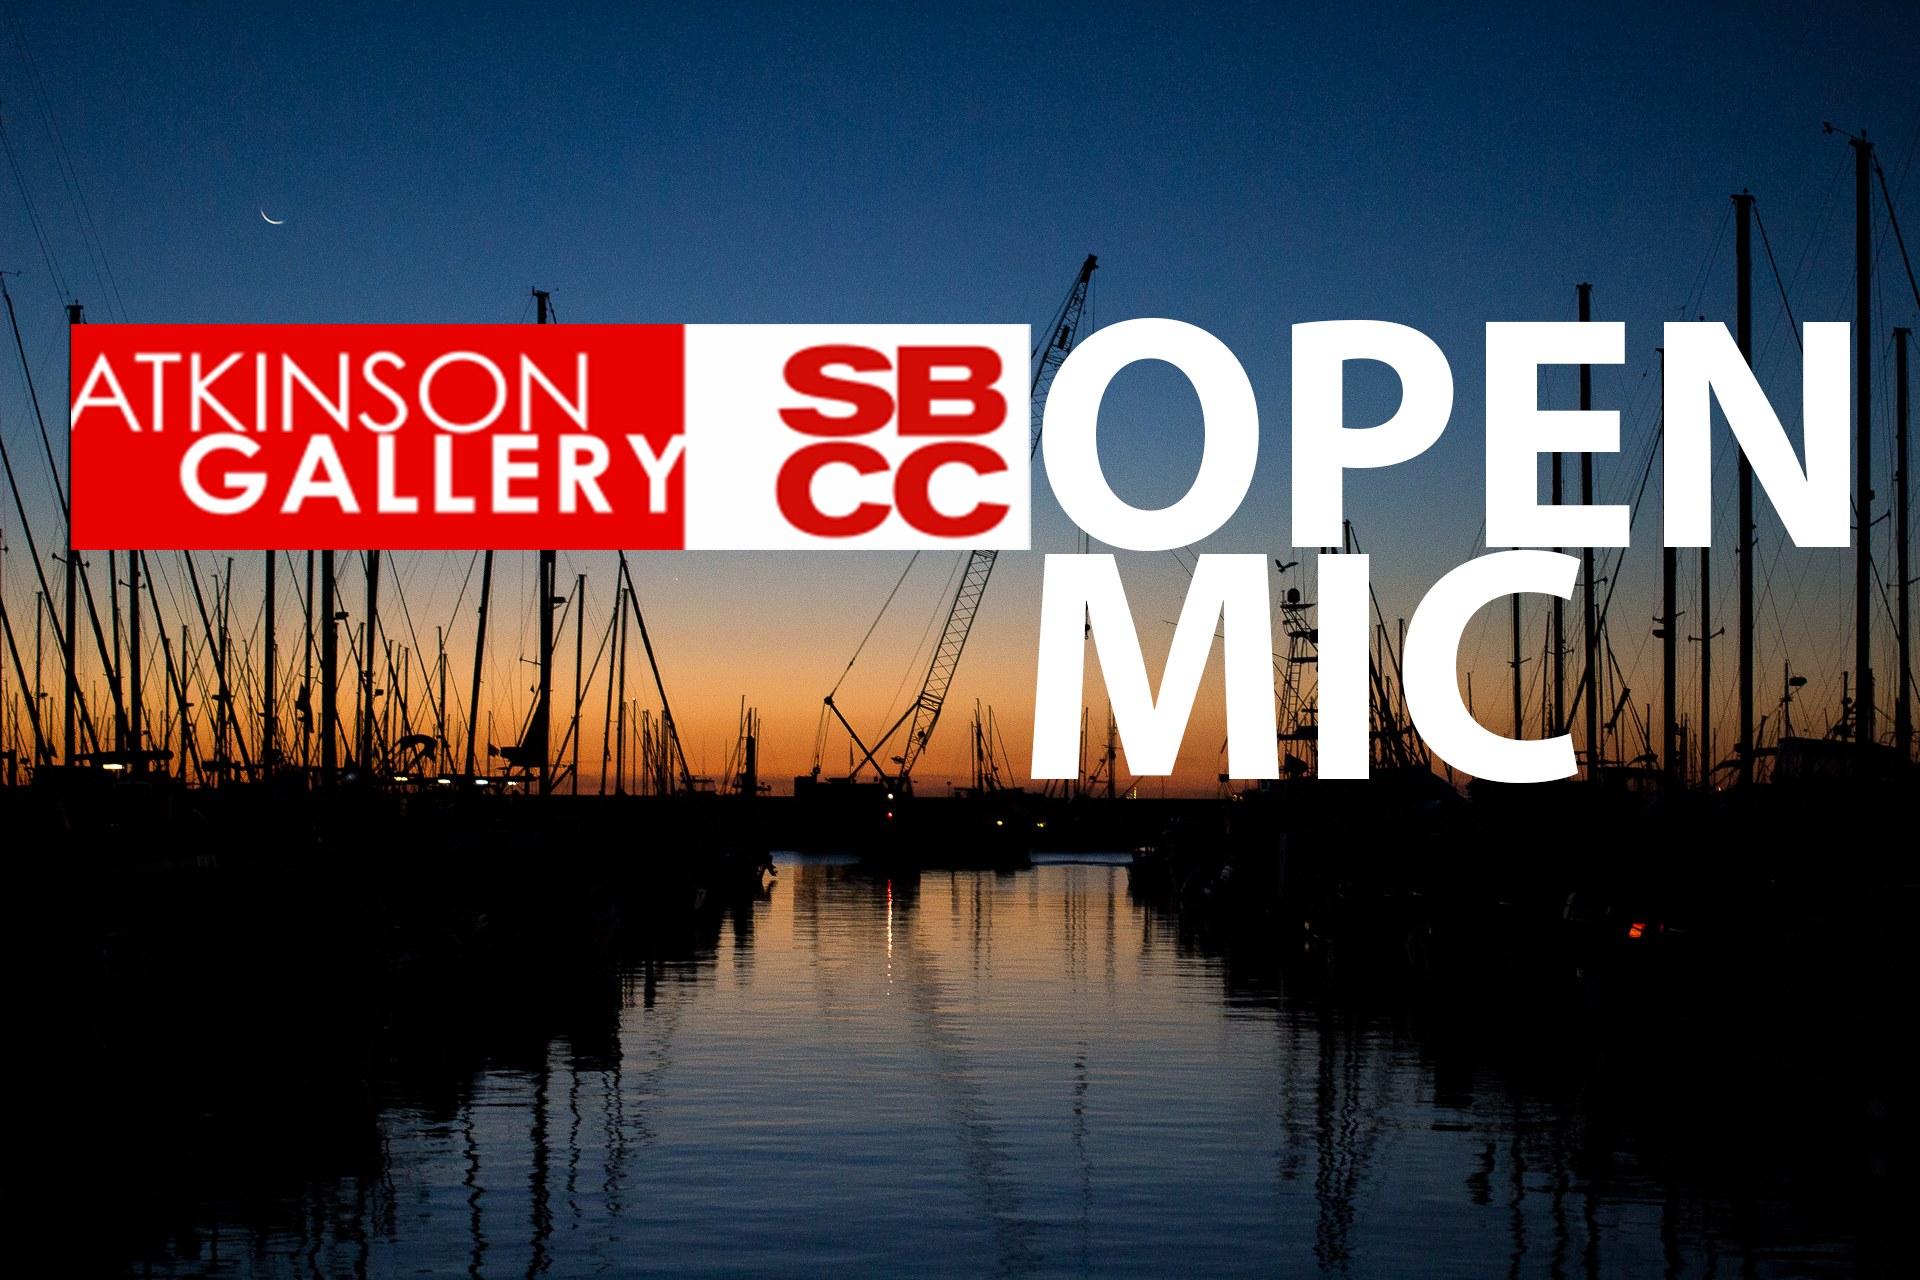 Atkinson Open Mic